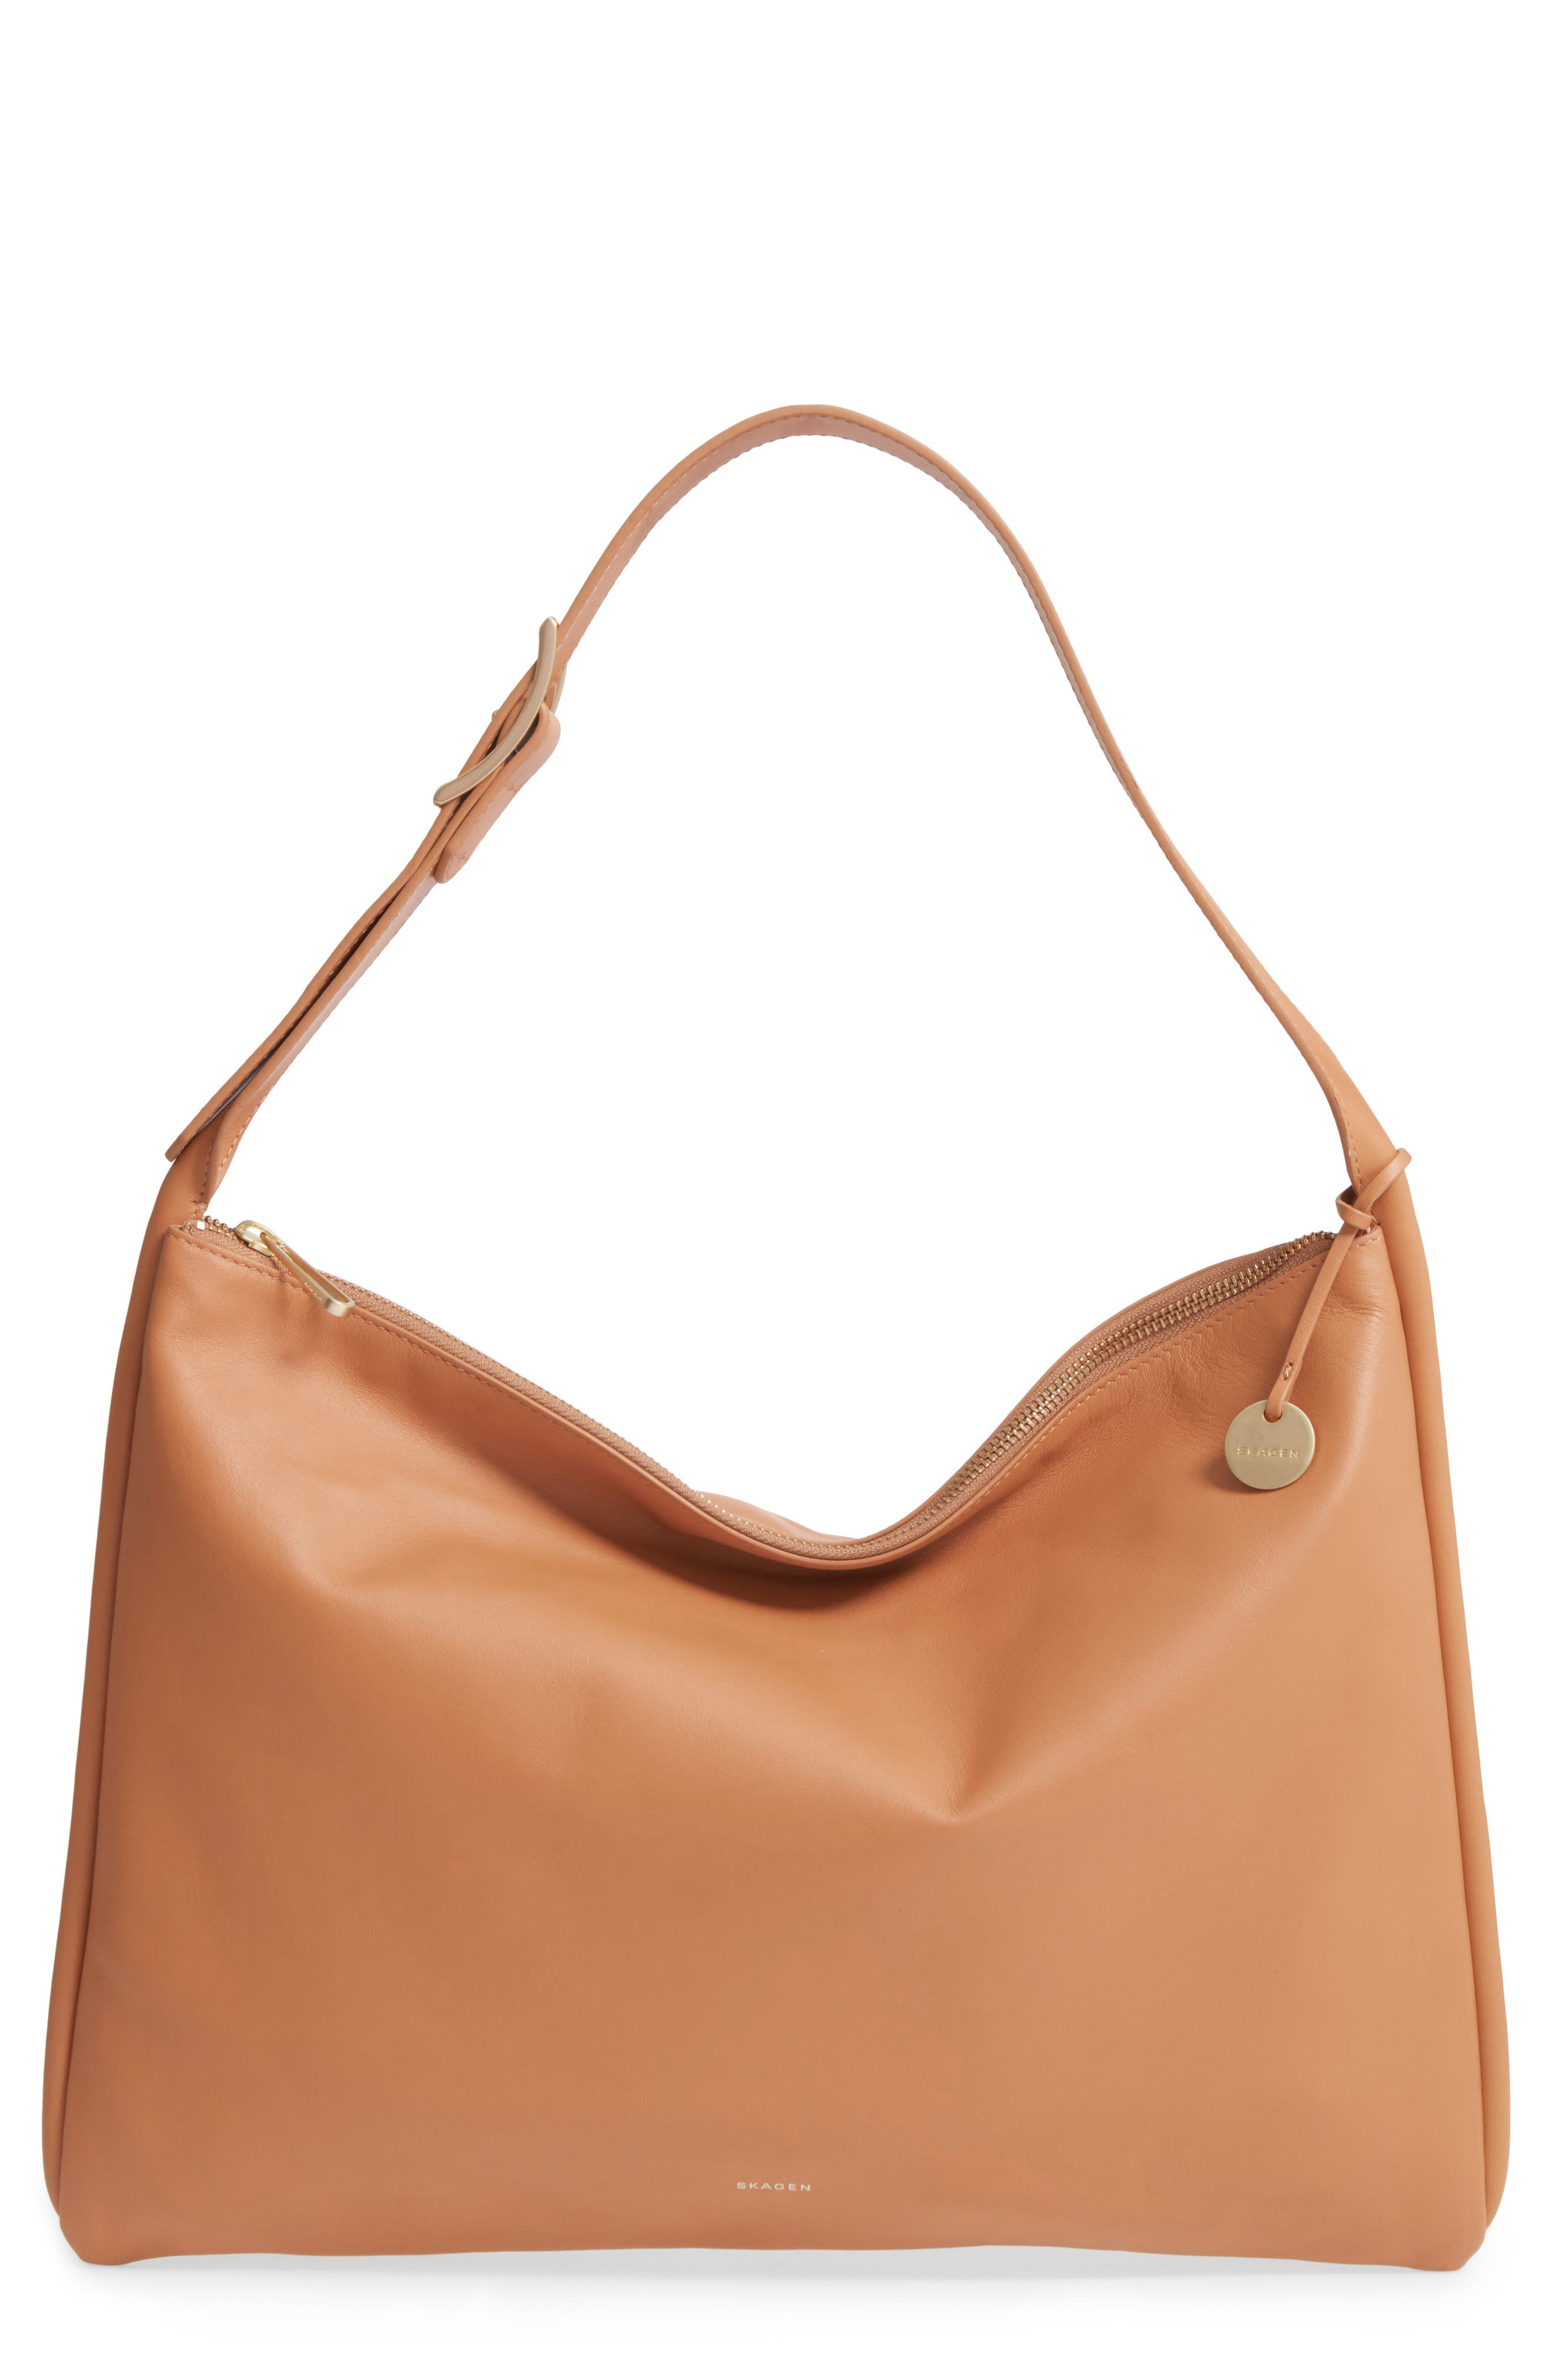 Anesa Leather Shoulder Bag,                             Main thumbnail 1, color,                             Tan